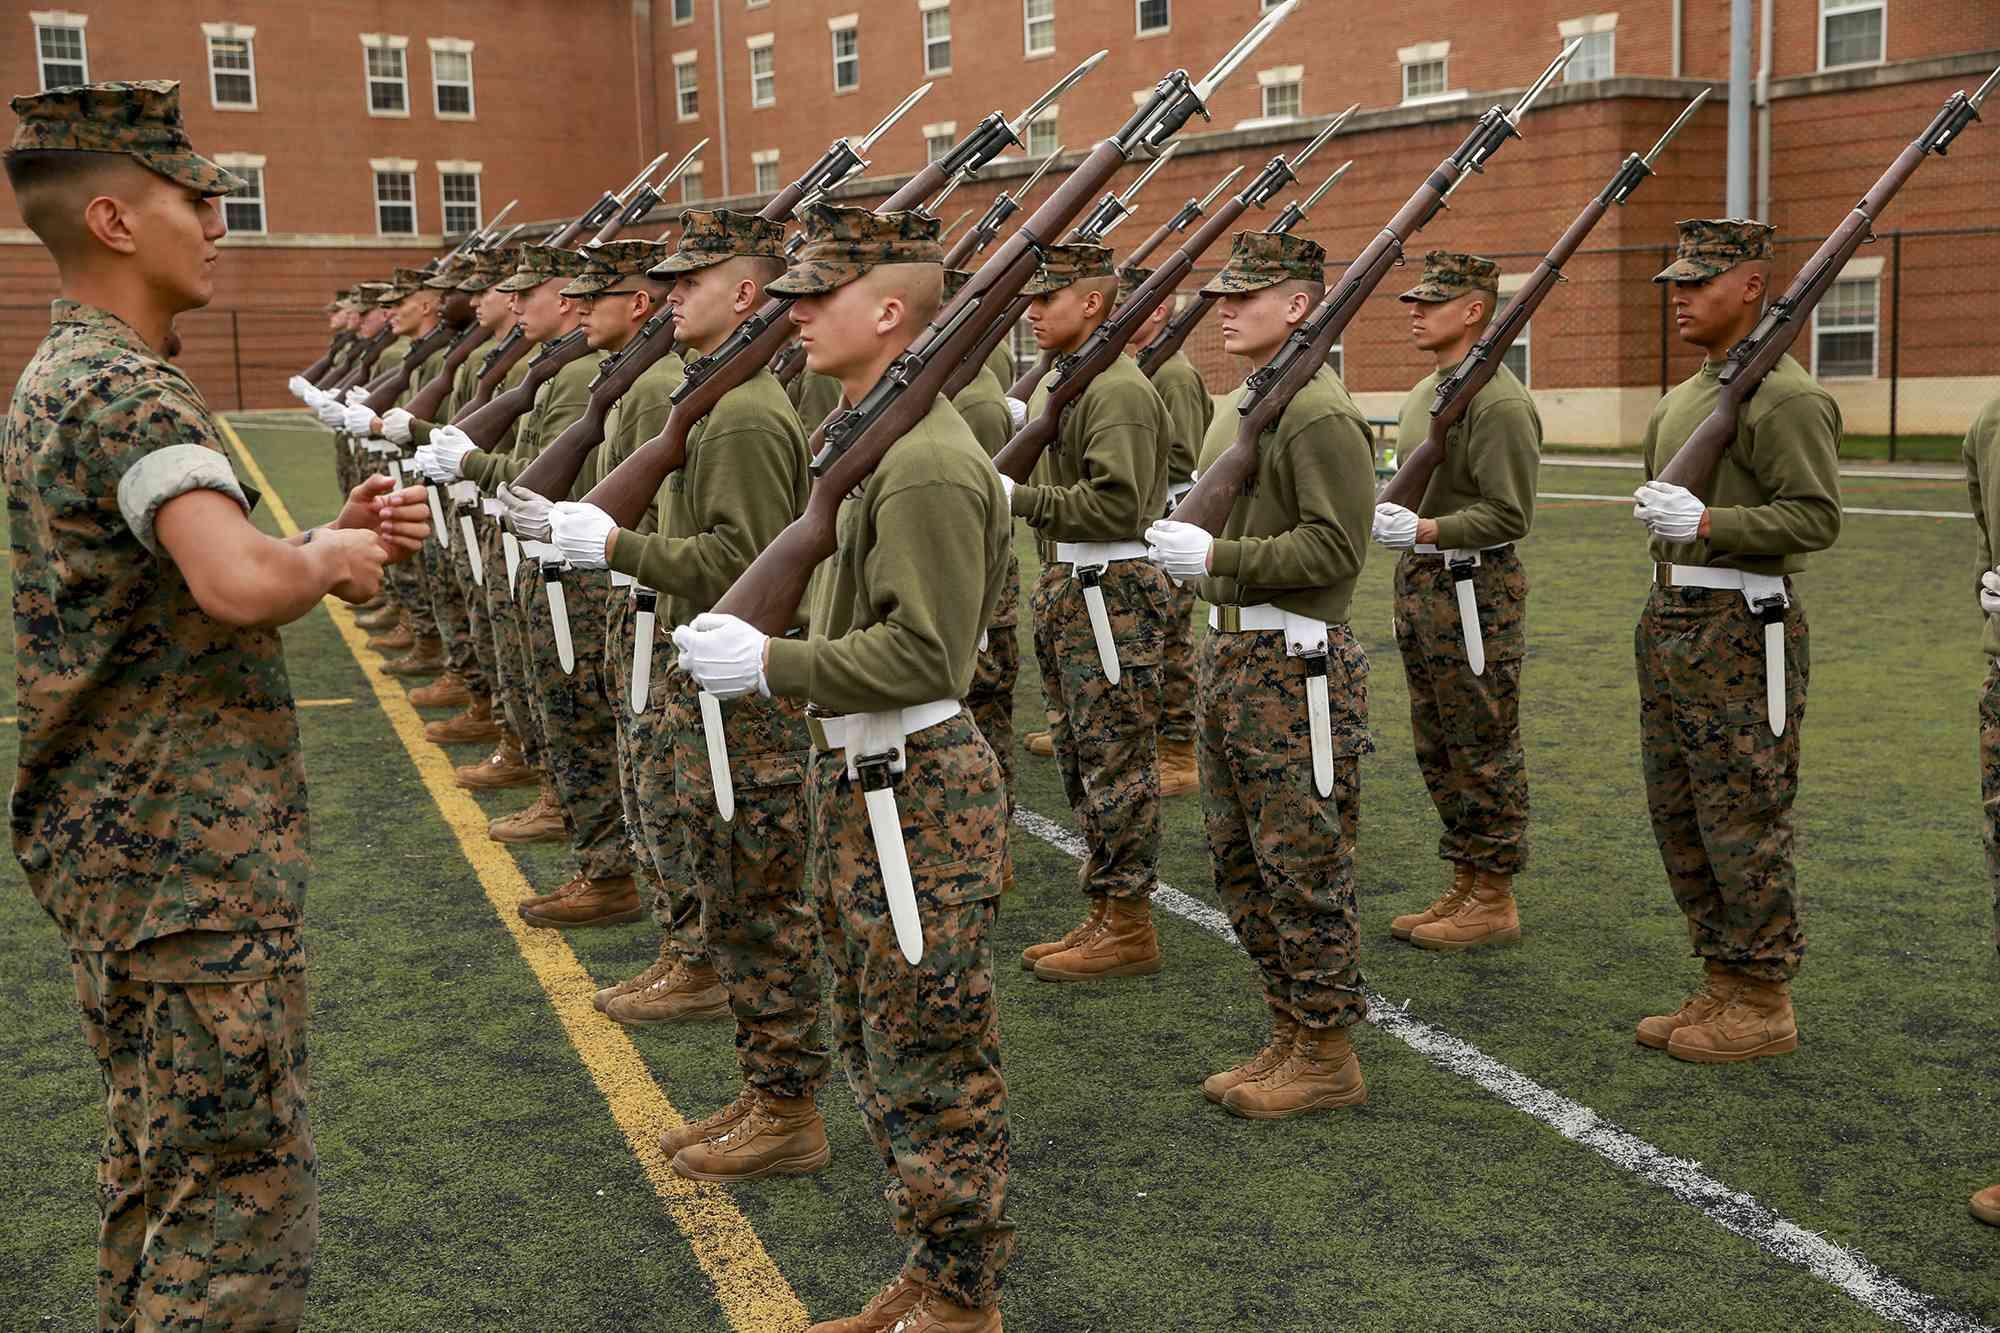 Practice rifle manual at Marine Barracks Washington, D.C.